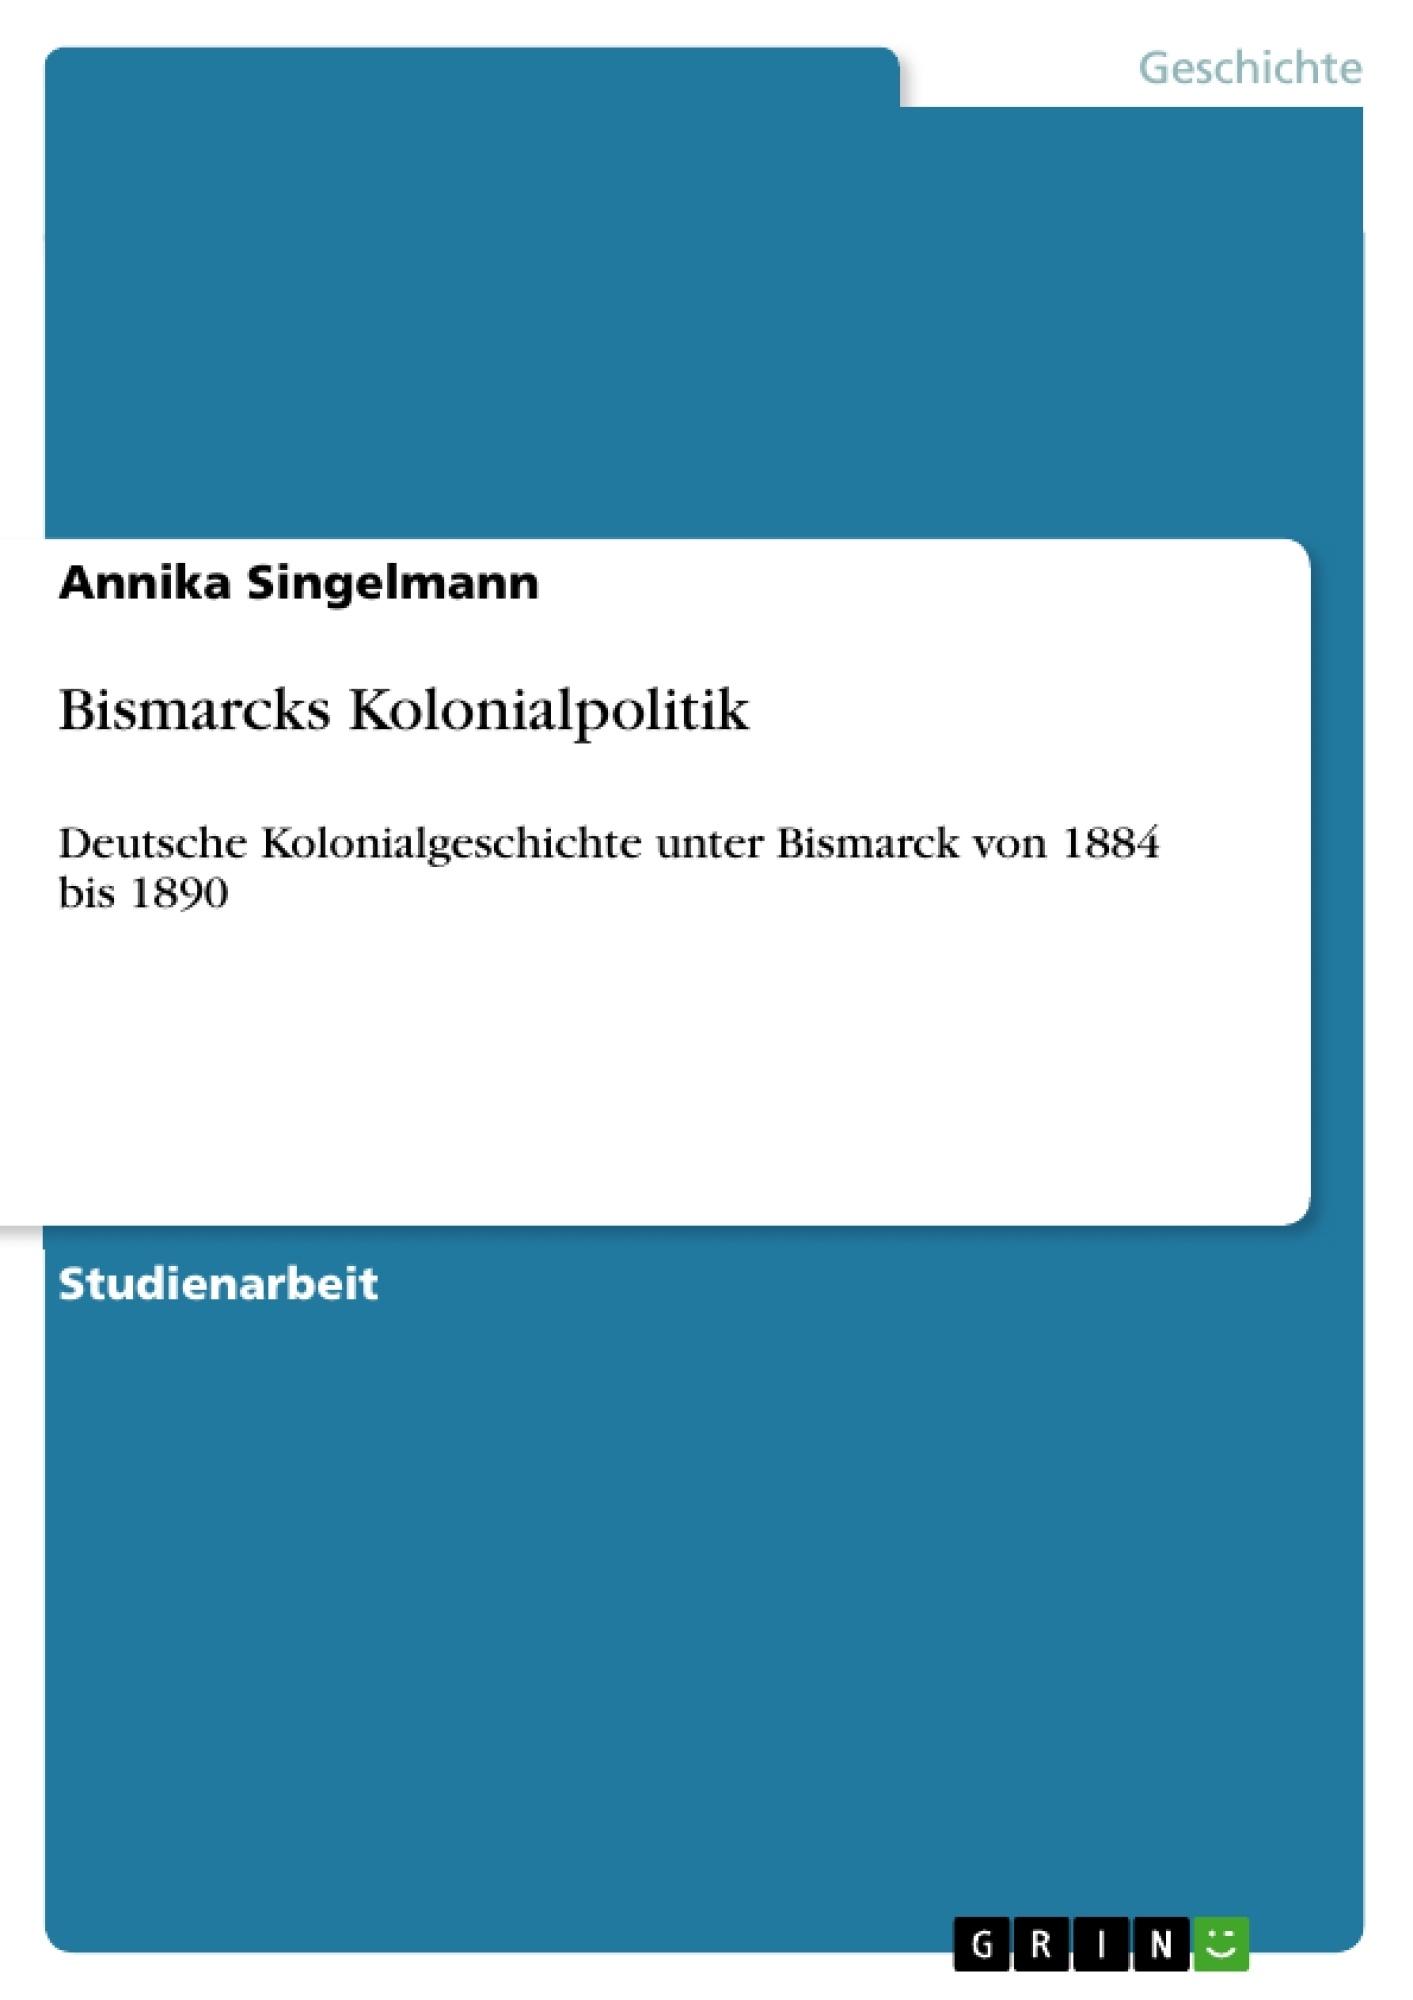 Titel: Bismarcks Kolonialpolitik